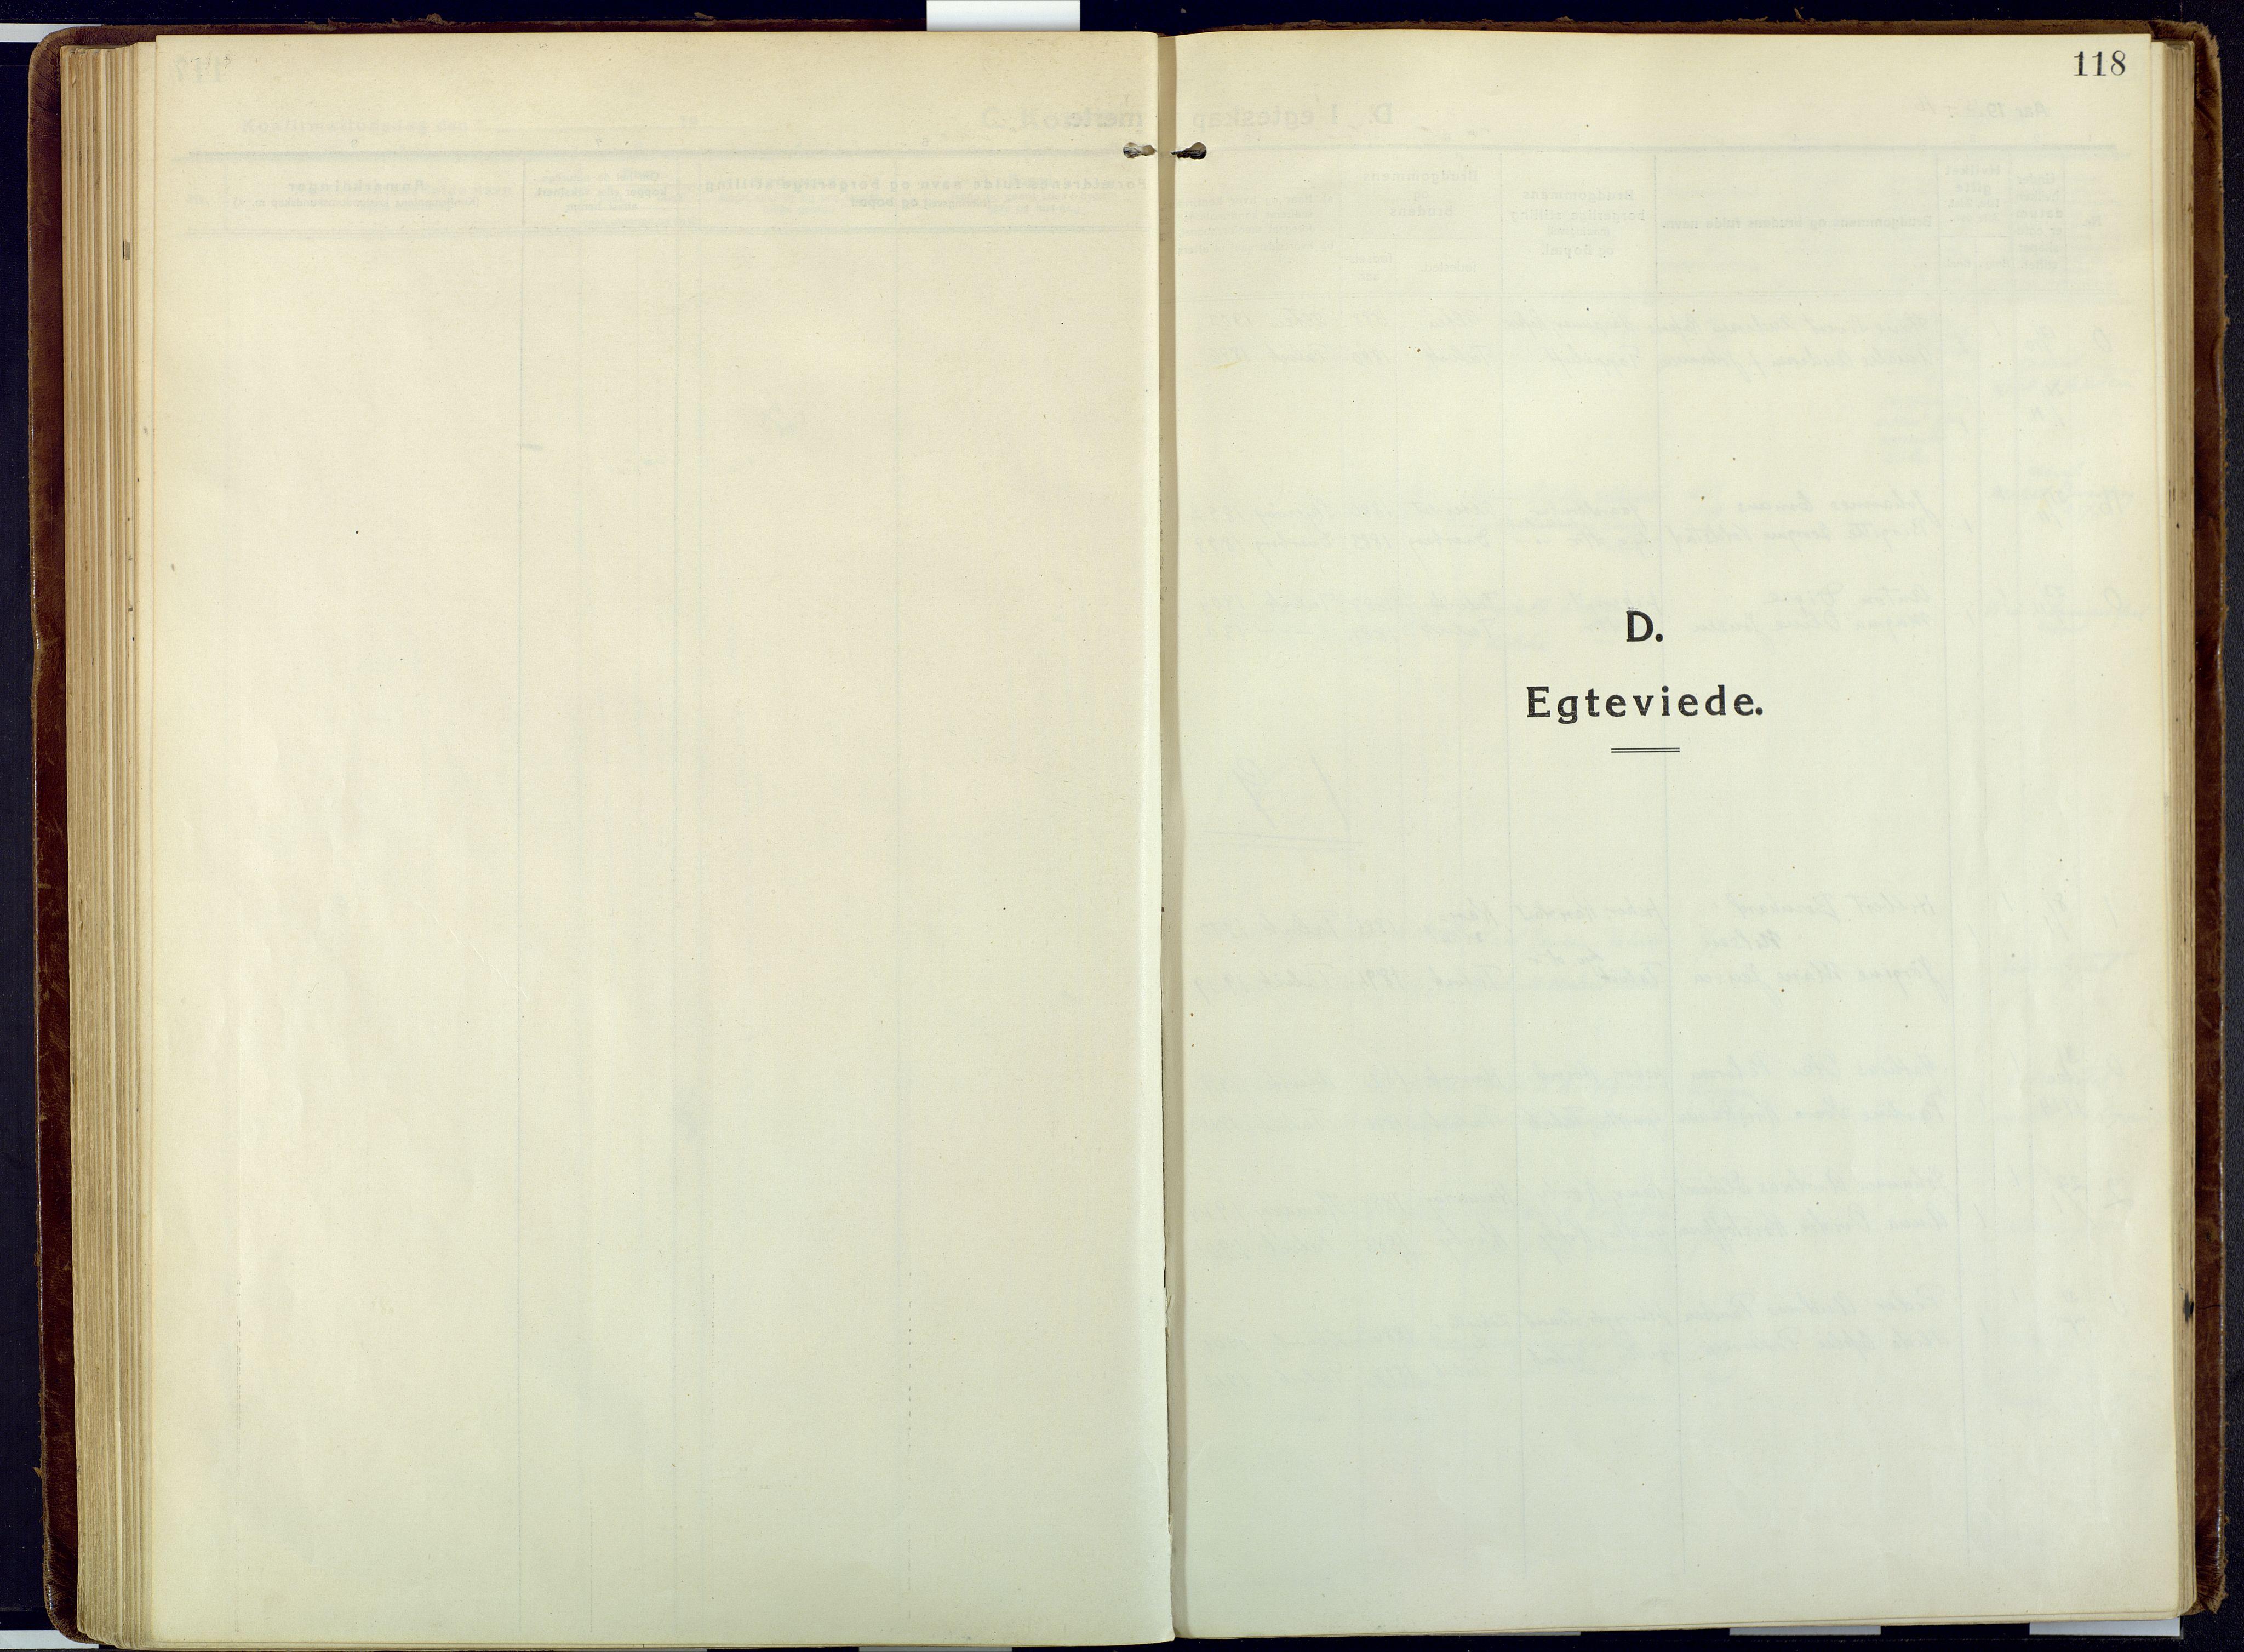 SATØ, Talvik sokneprestkontor, H/Ha/L0018kirke: Ministerialbok nr. 18, 1915-1924, s. 118